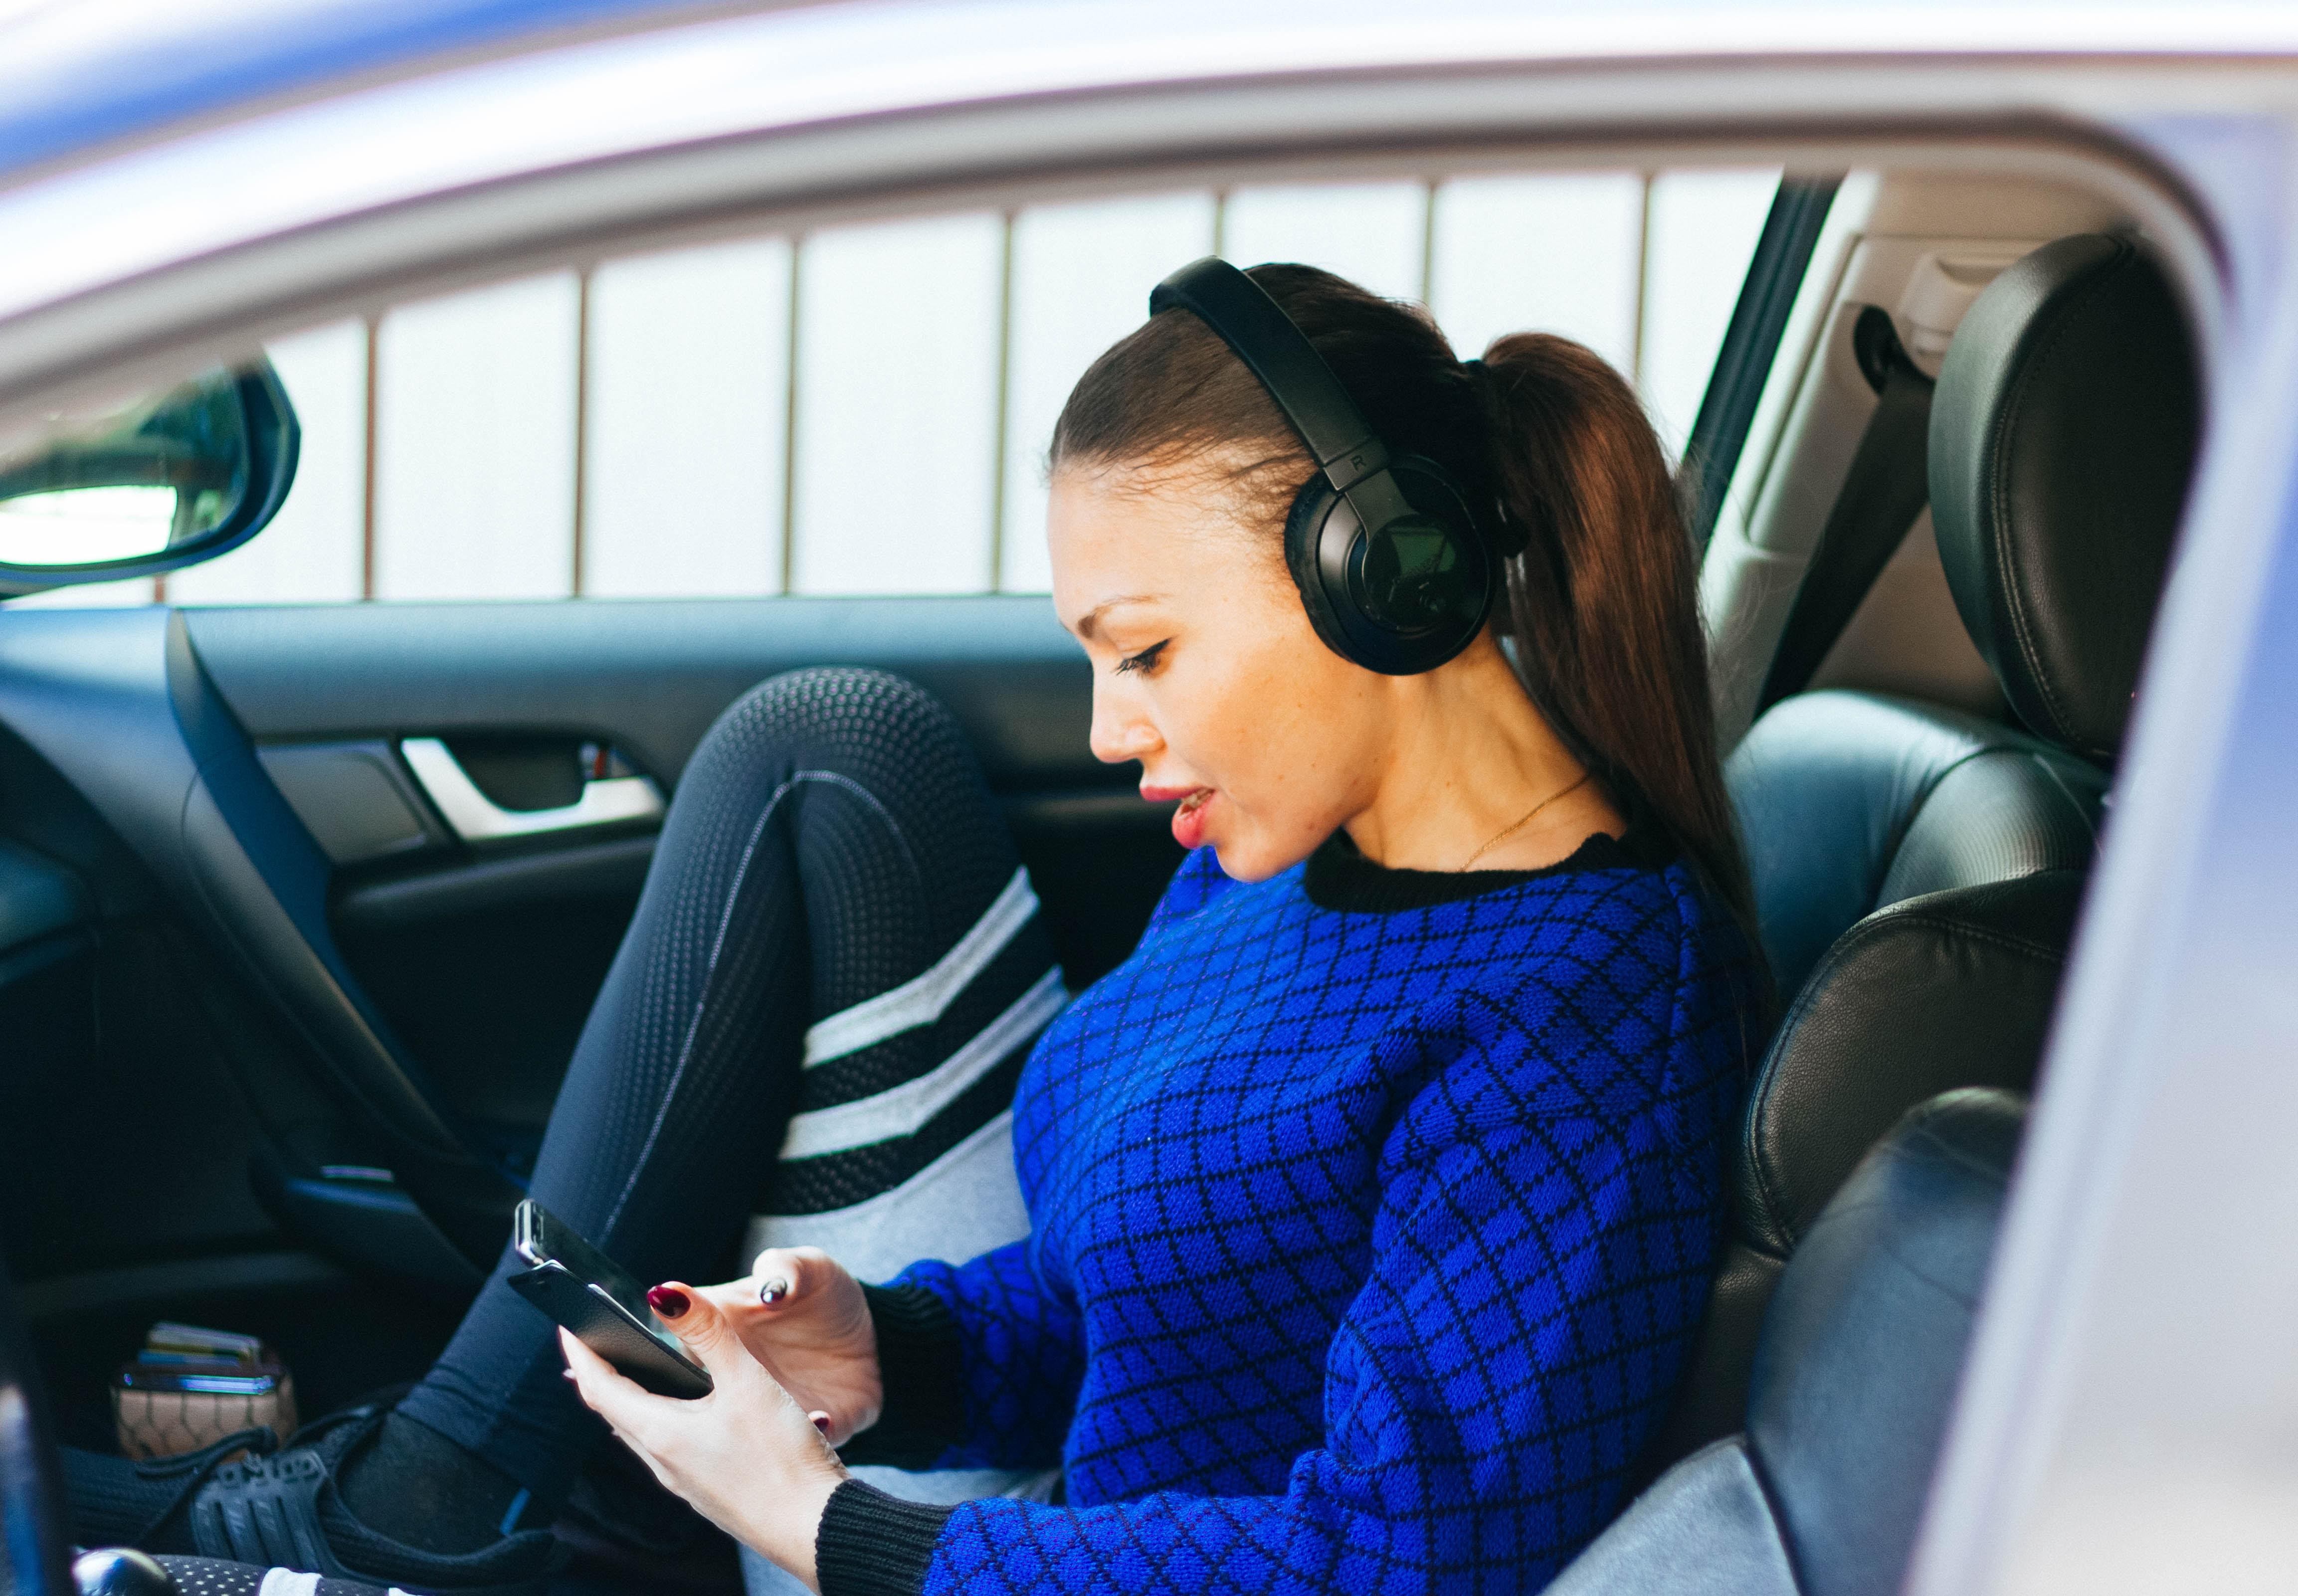 woman wearing headphones inside vehicle during daytime